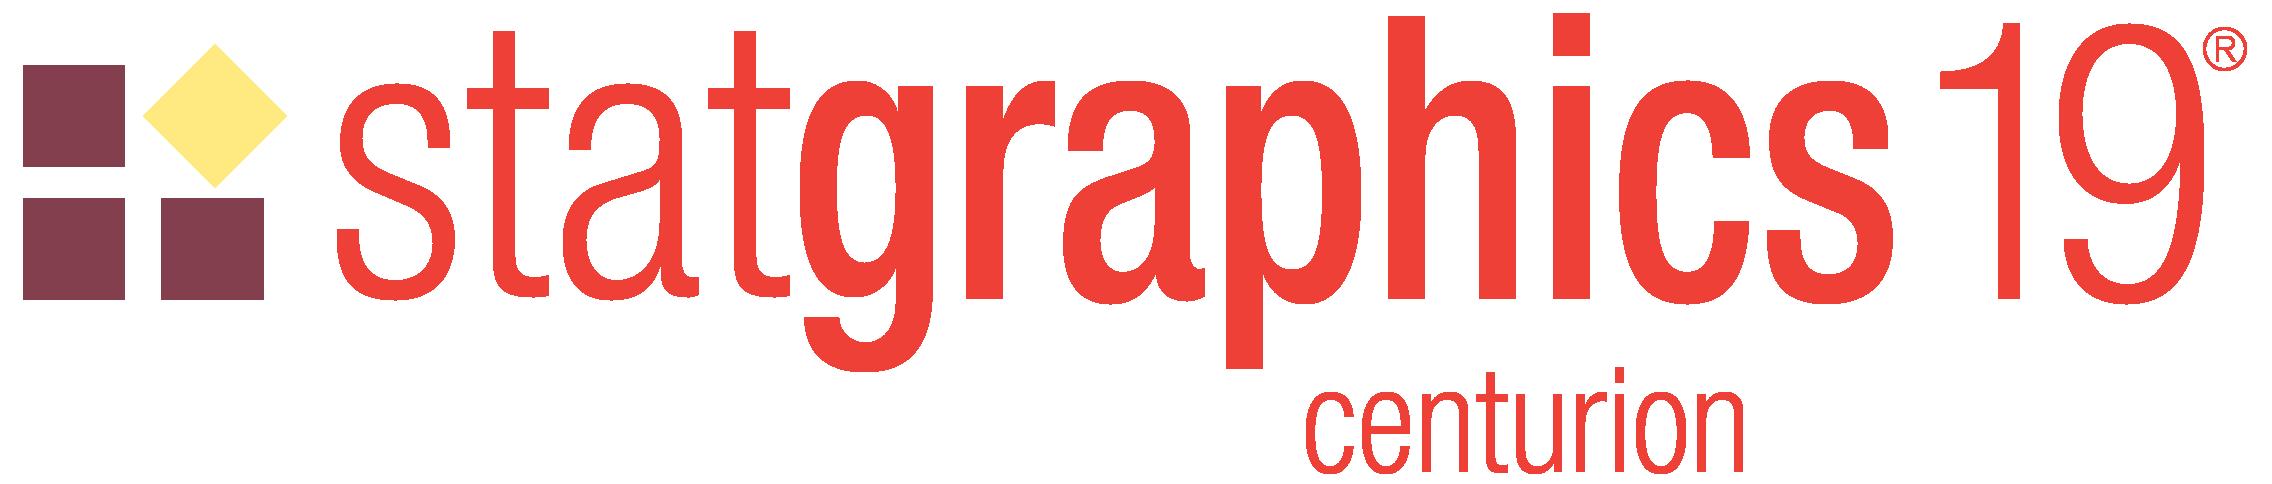 Statgraphics 19 logo